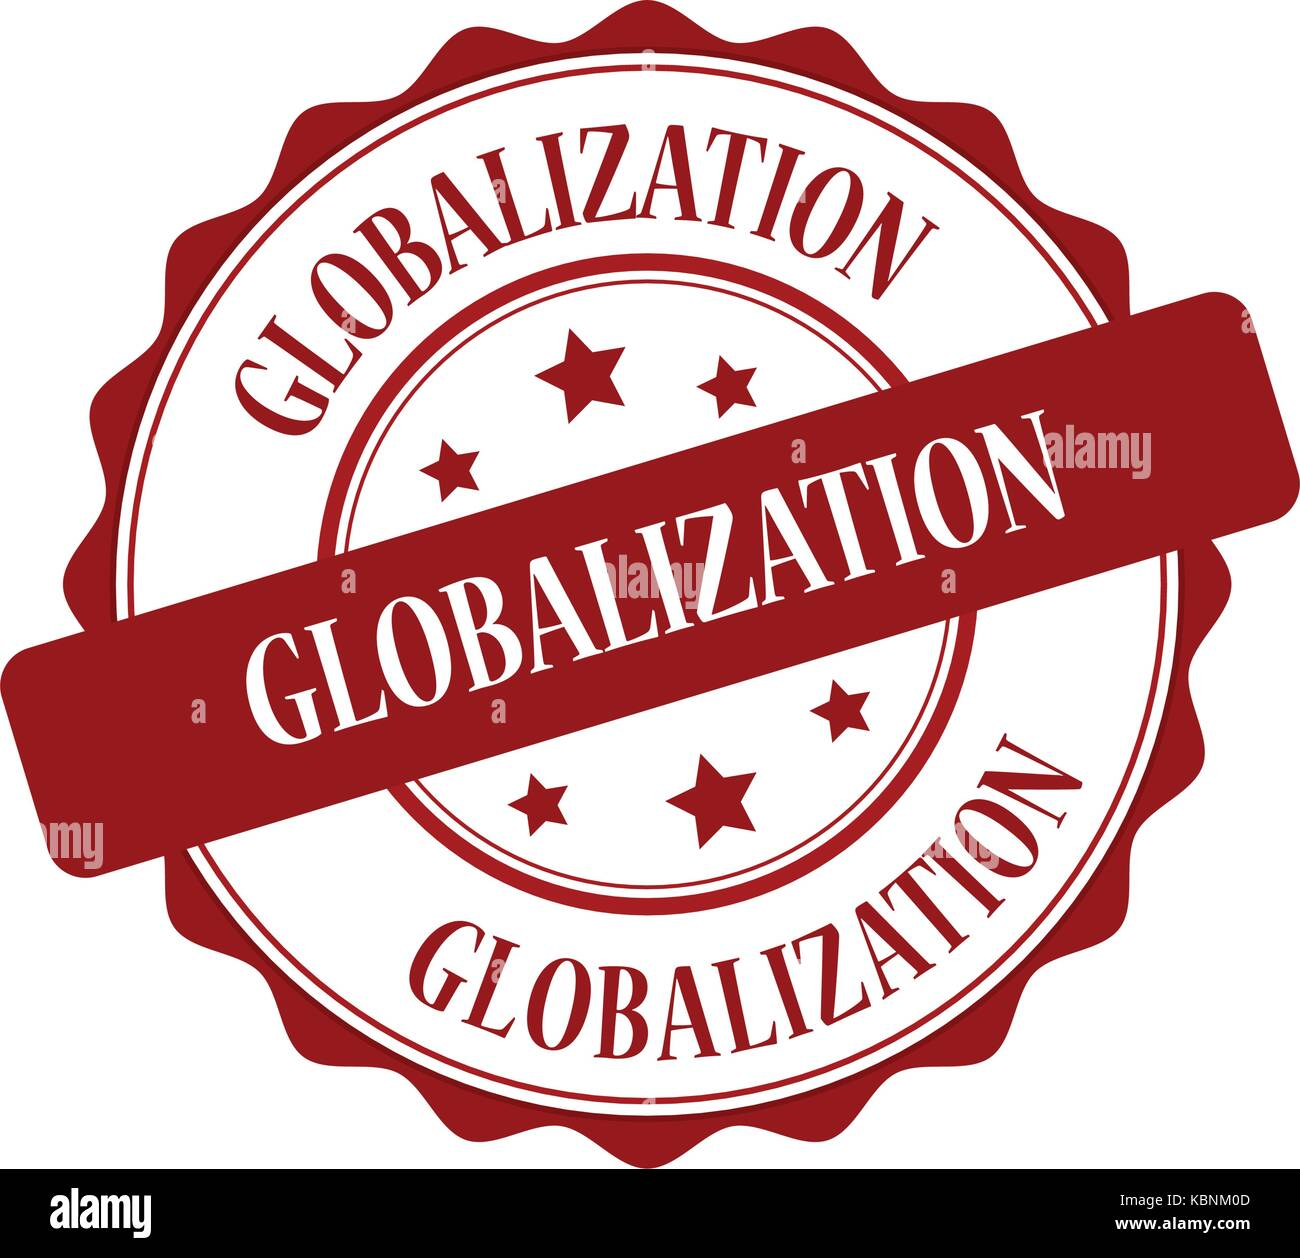 Globalization red stamp illustration - Stock Image